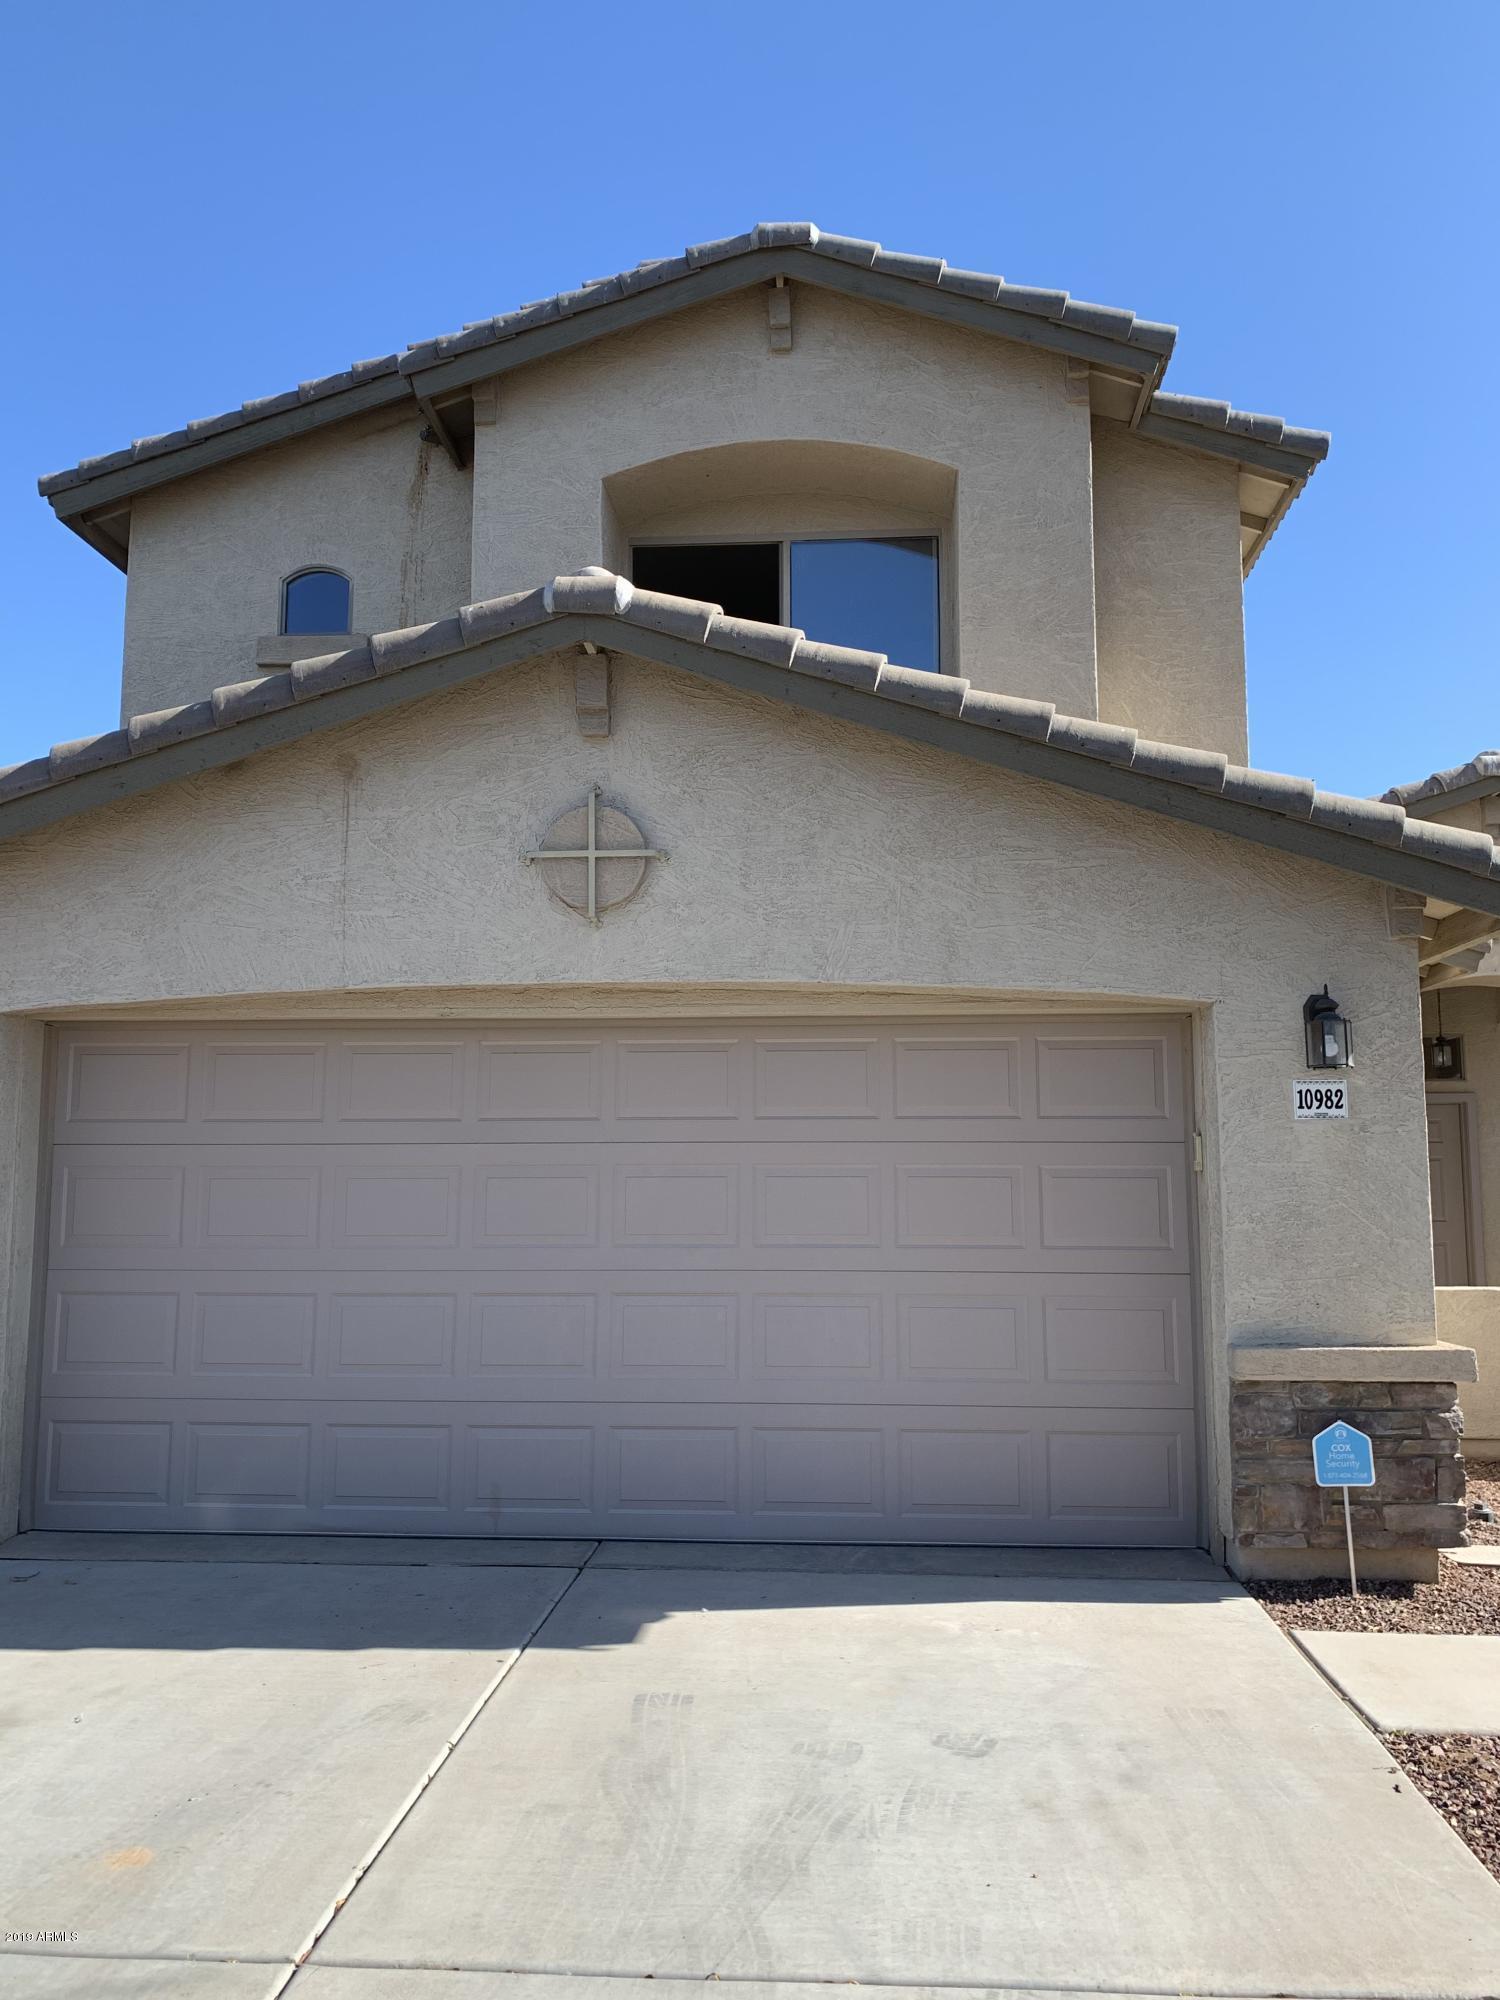 MLS 5978397 10982 W RIO VISTA Lane, Avondale, AZ 85323 Avondale Homes for Rent